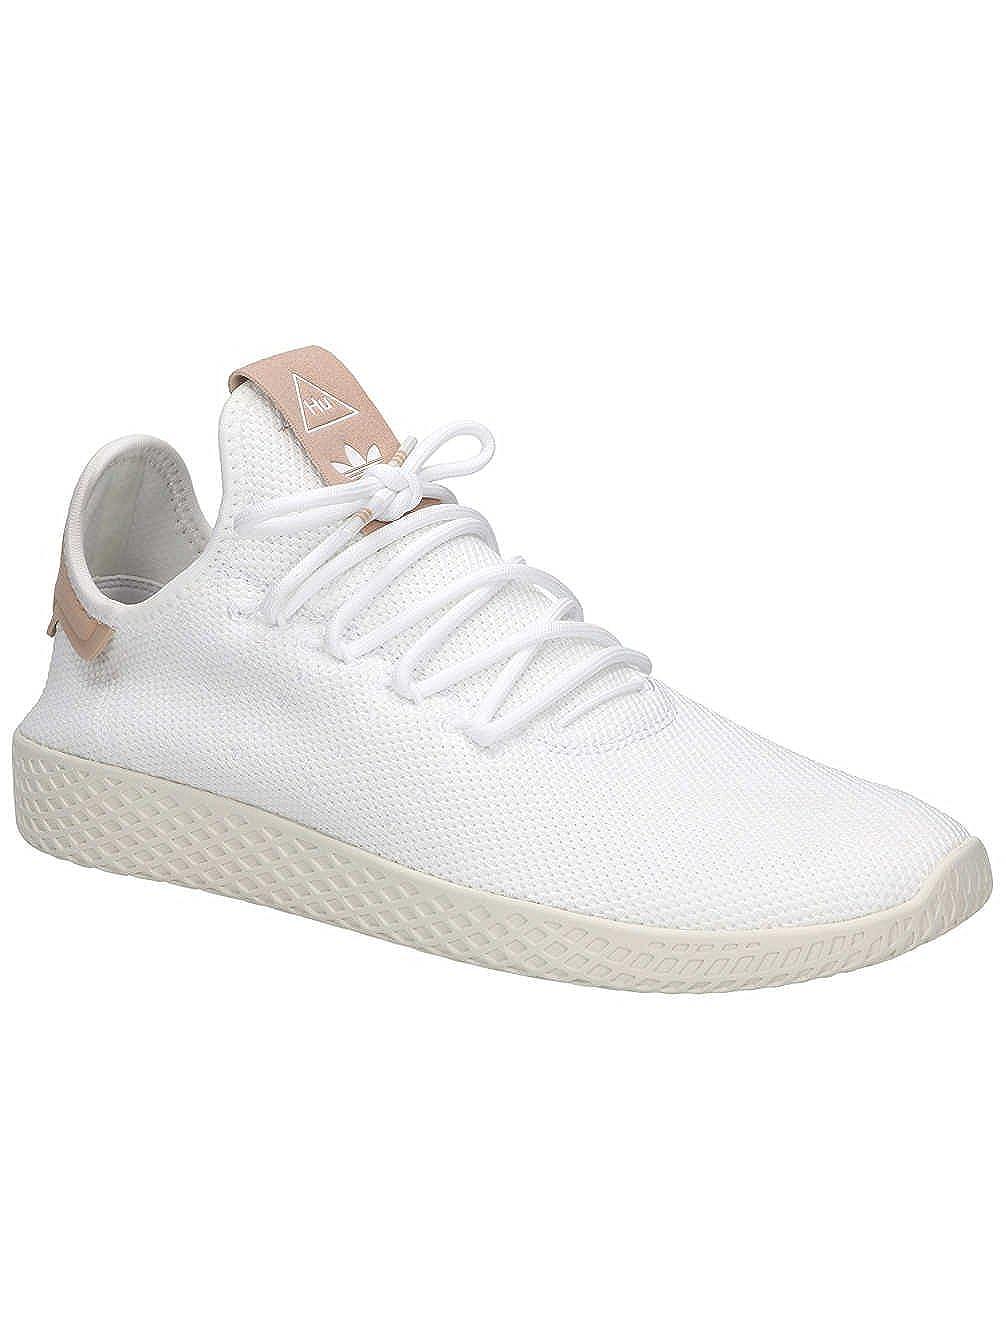 Pw Tennis Originals Hu Adidas 13 Sneaker WeißSchuhgröße Cq2169 45 VpSGUzMq